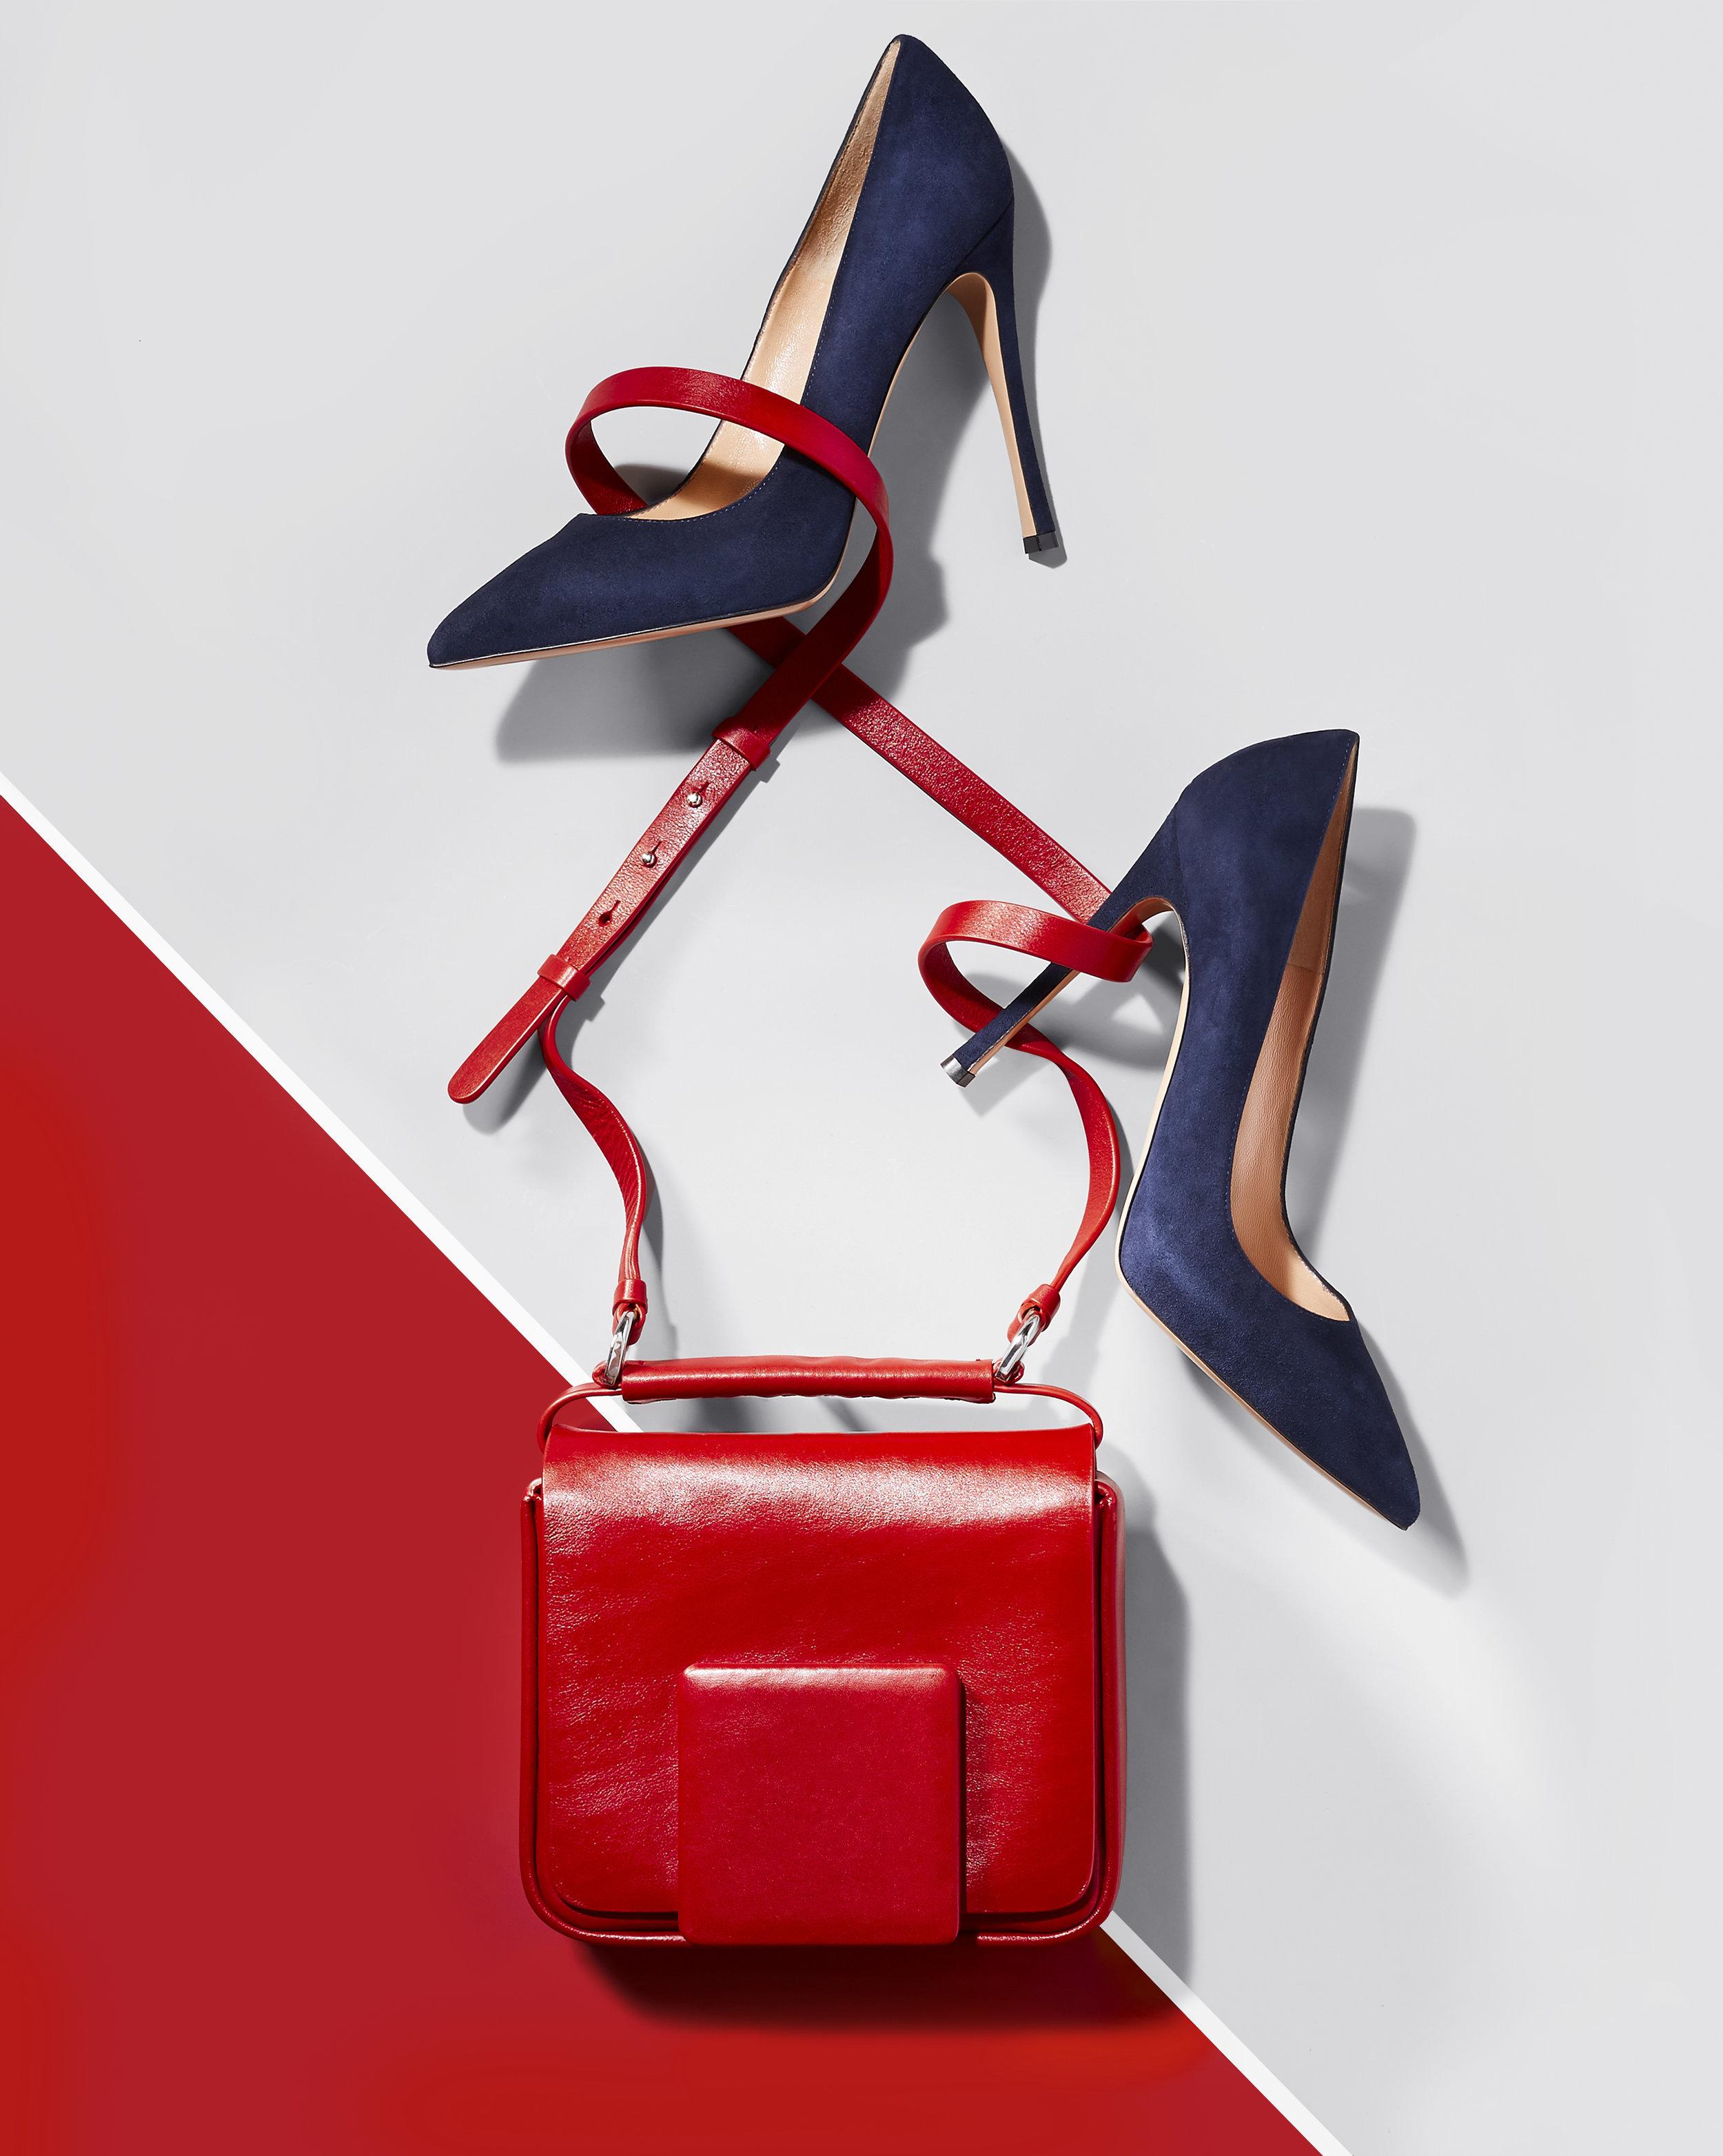 6_Red_Bag_Blue_Shoe.jpg